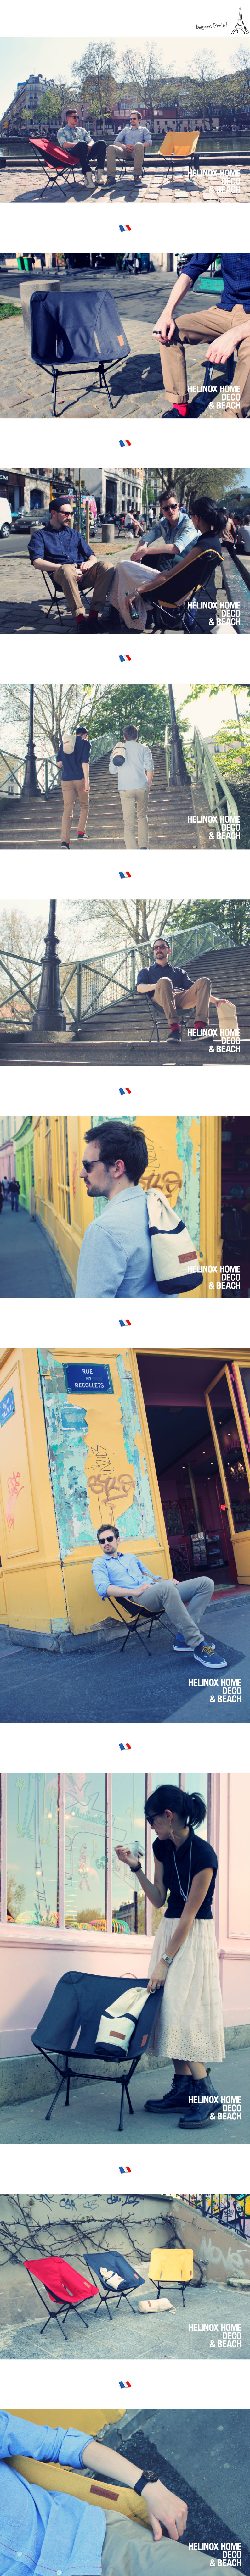 20130518-Helinox-Home-파리-사진.jpg